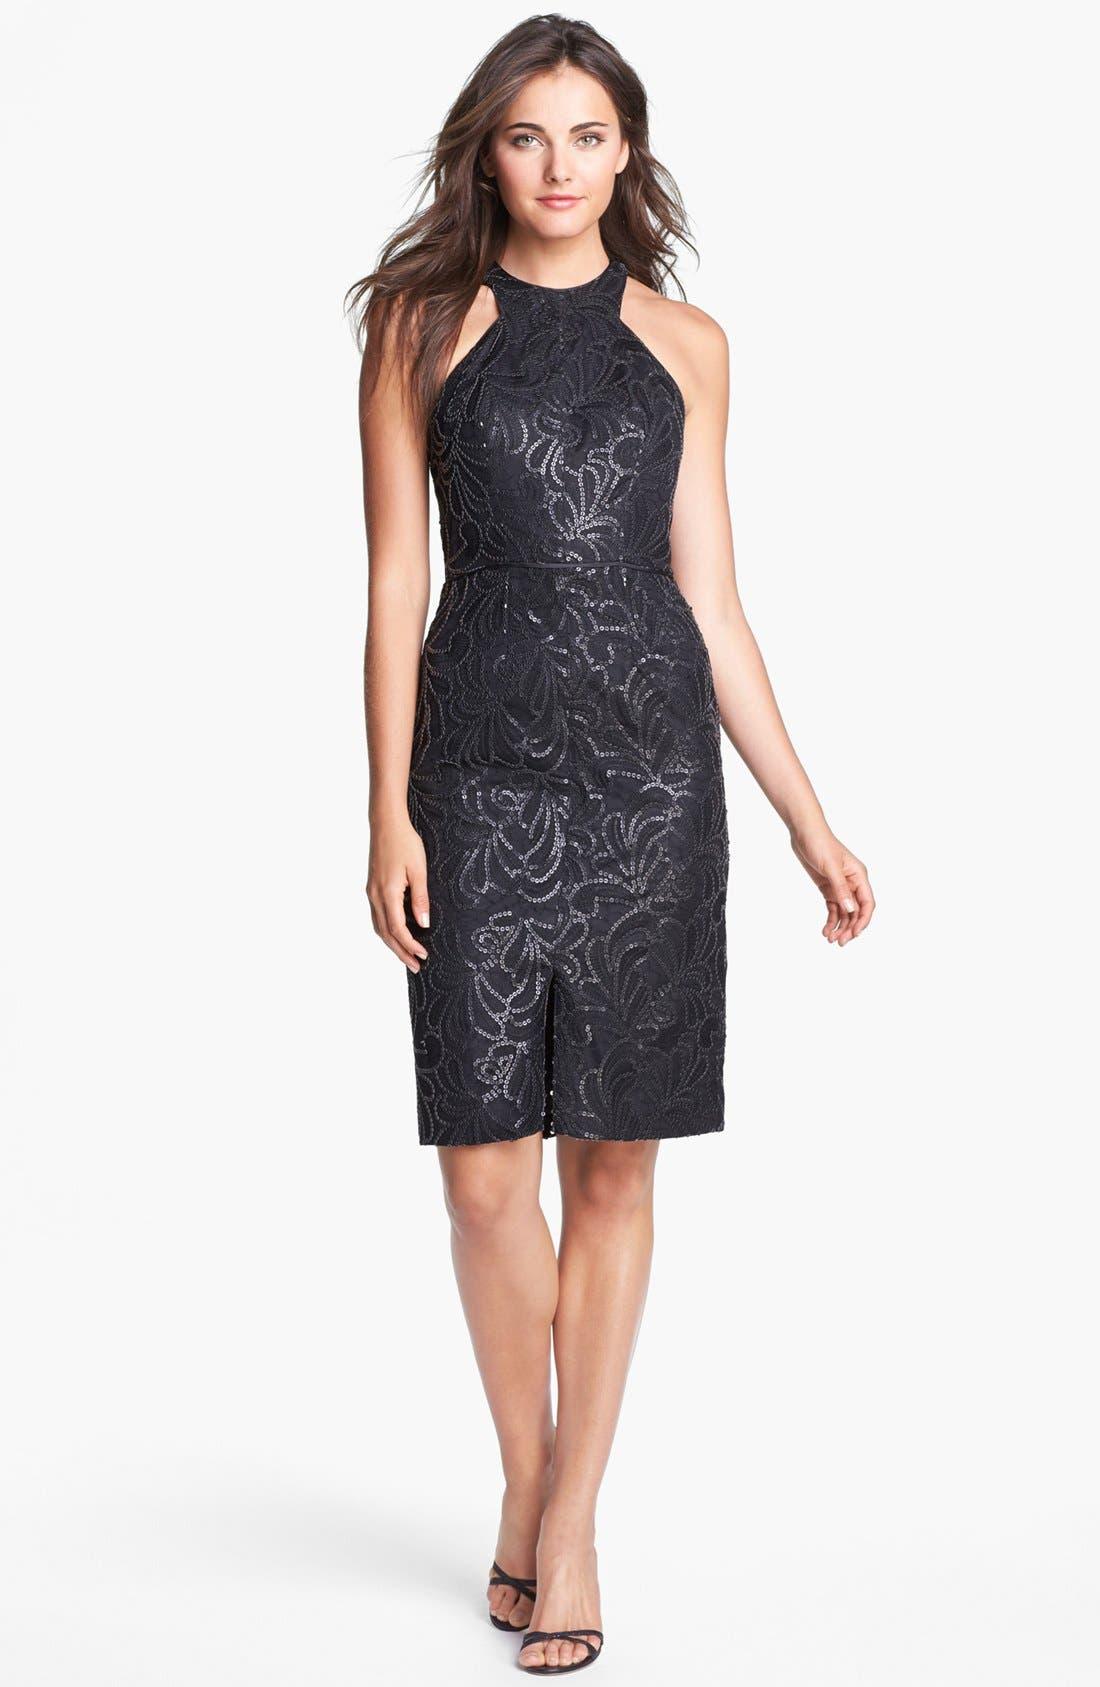 Main Image - Jill Jill Stuart Faux Leather Sequin Embellished Sheath Dress